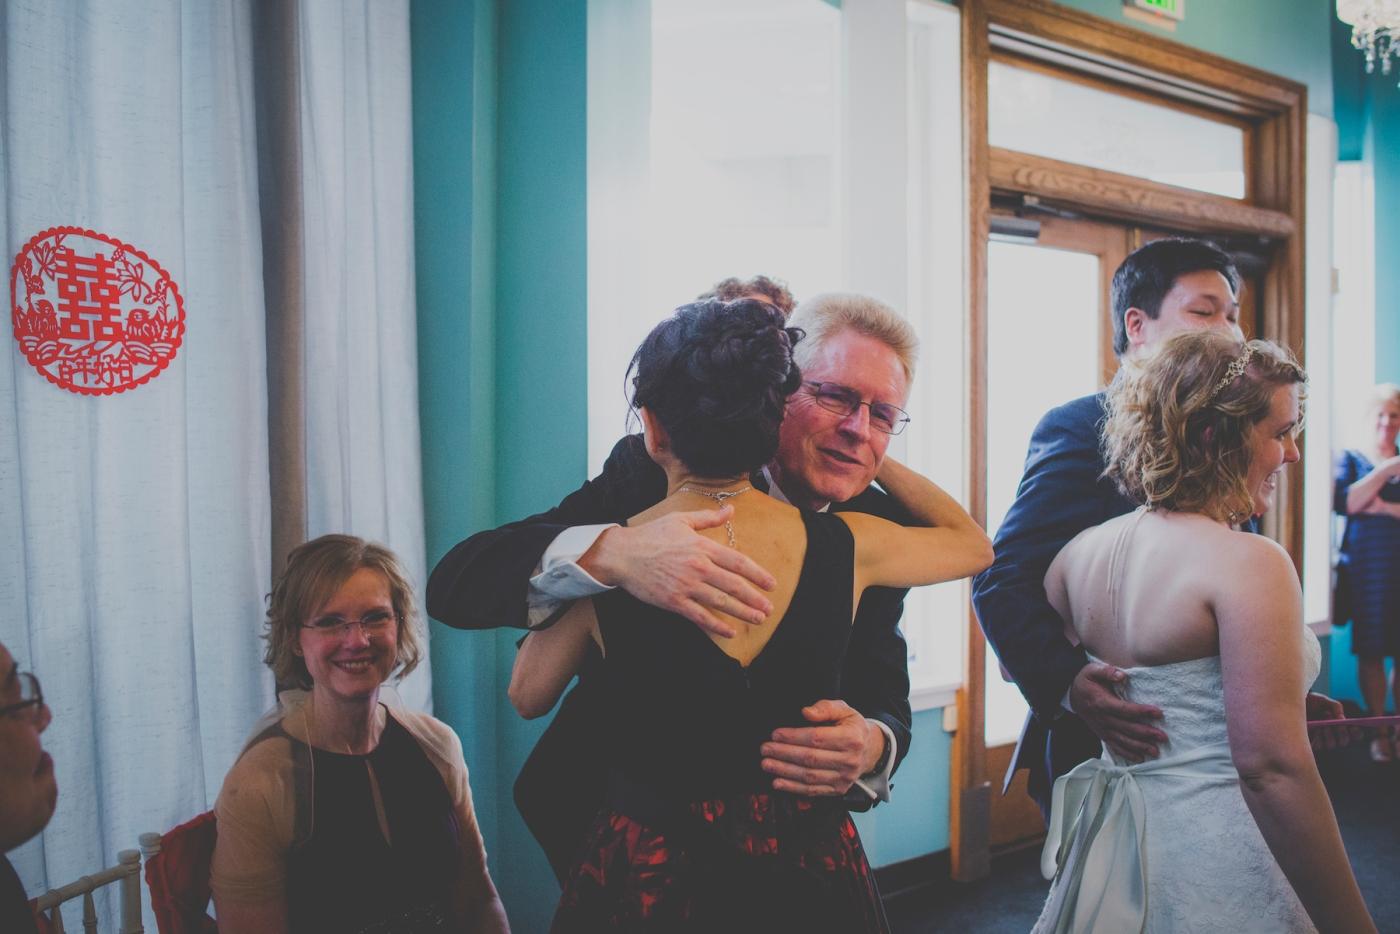 DSC_3012Everett_Wedding_Ballroom_Jane_Speleers_photography_Rachel_and_Edmund_teaceremony_2017